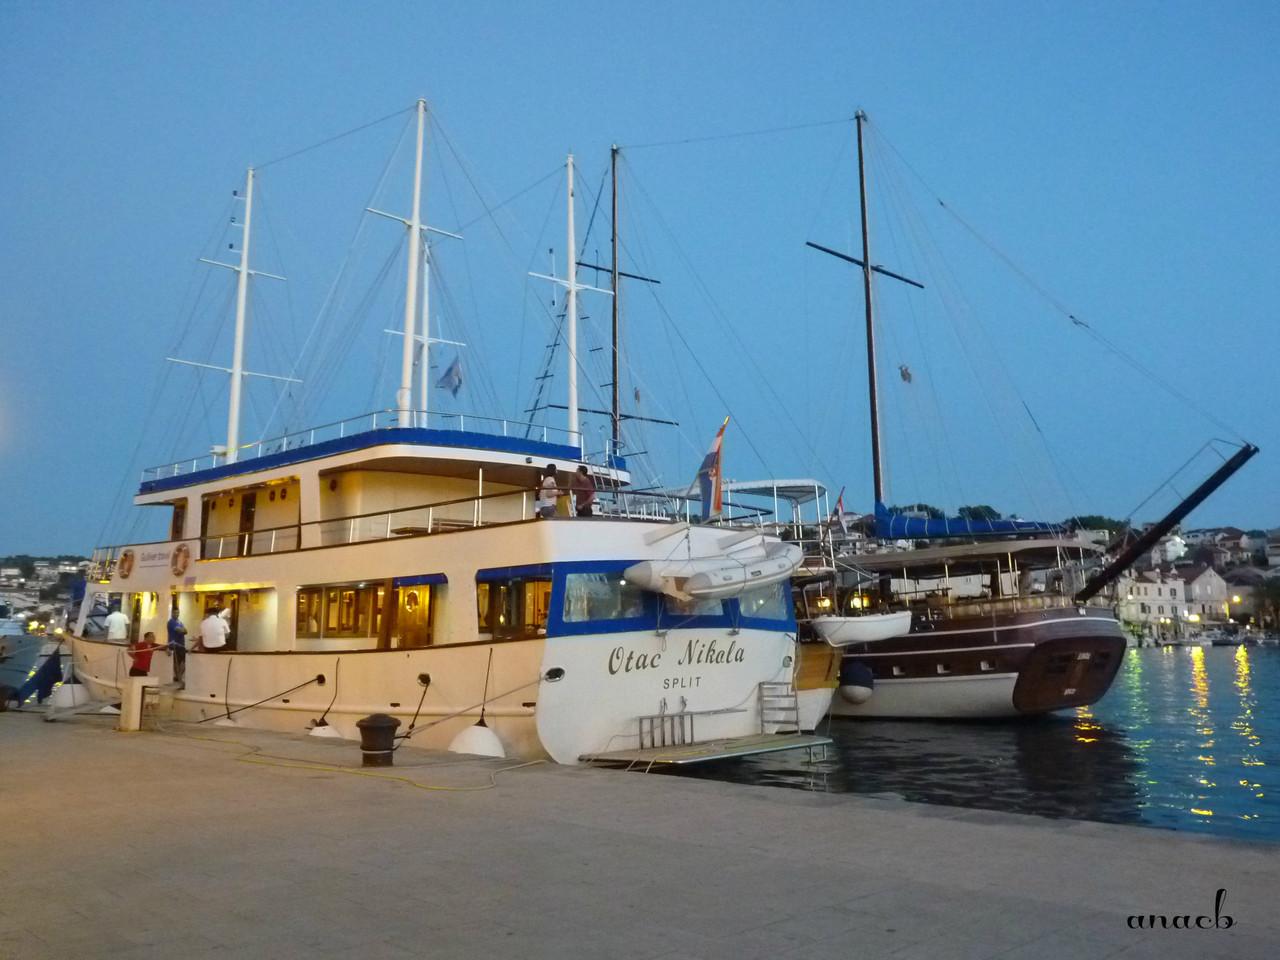 Trogir - Riva - viajarporquesim.blogs.pt.jpg